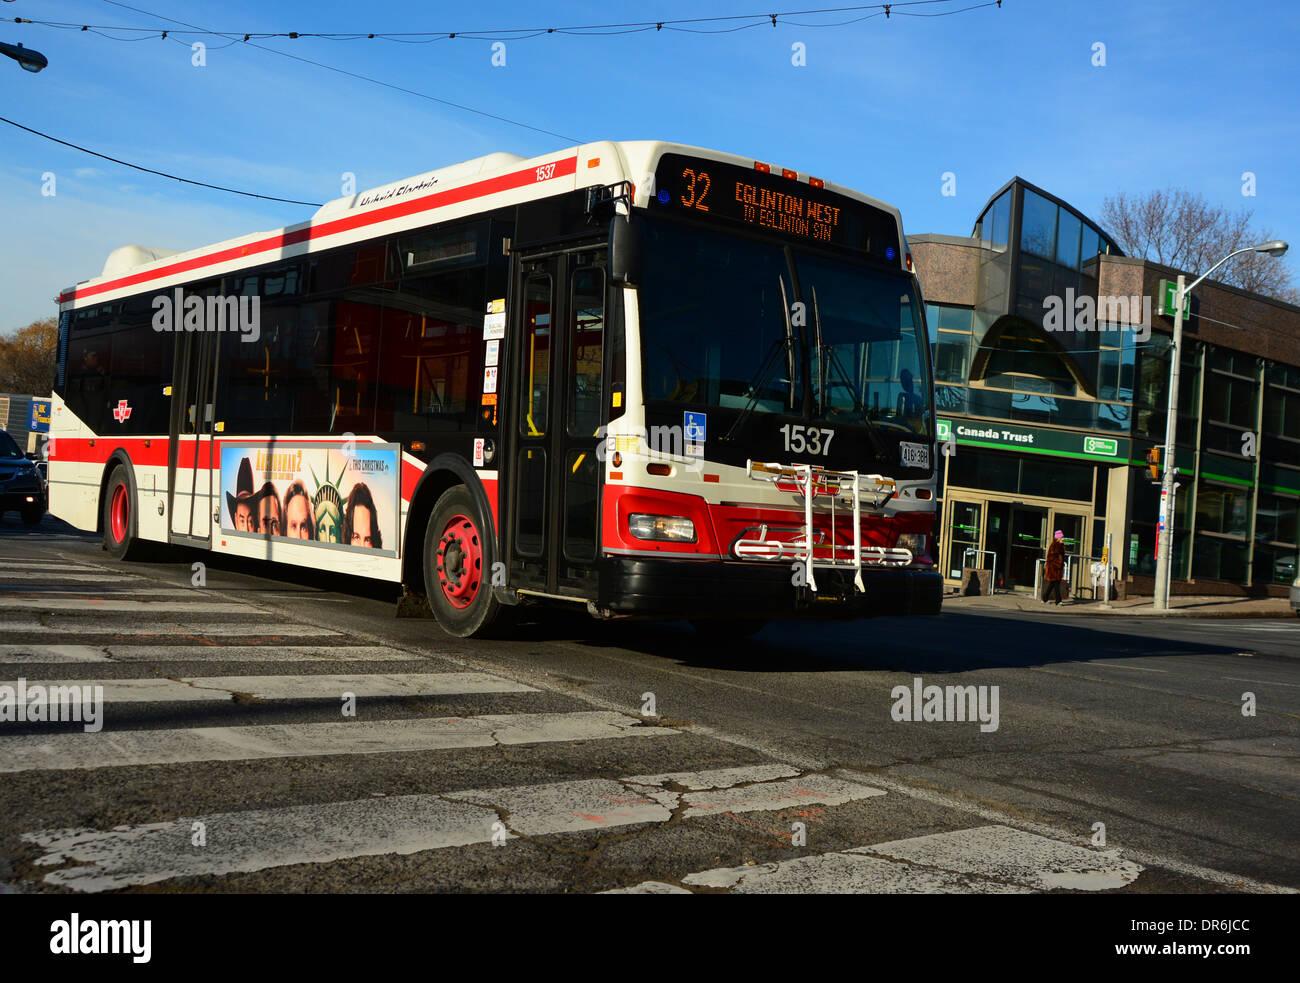 Public Transportation in Toronto, Canada - Stock Image